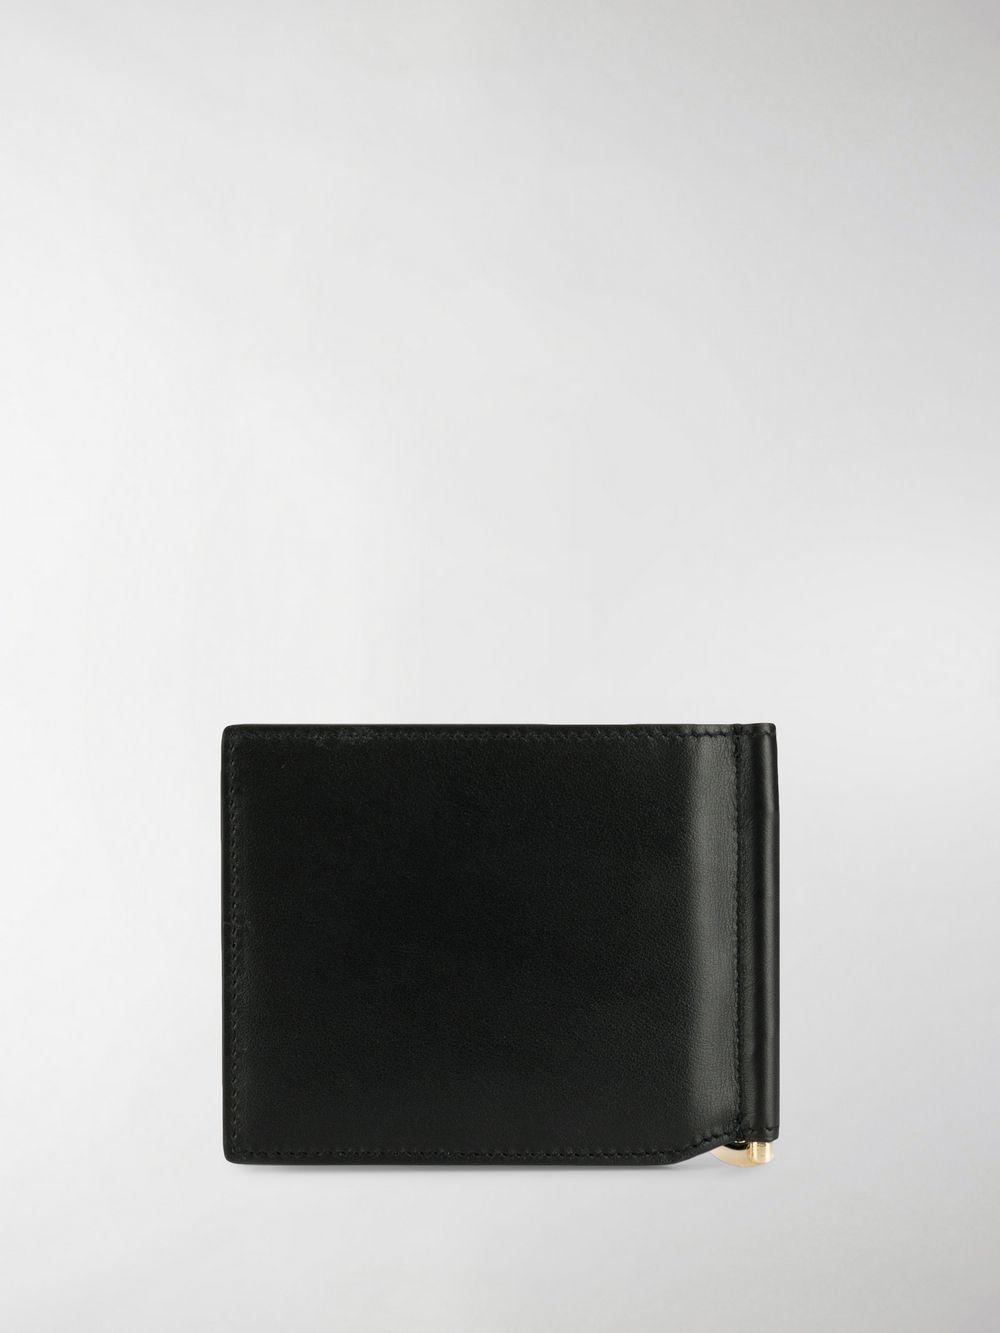 2fd02adf46 Lyst - Dolce & Gabbana Logo Print Wallet in Black for Men